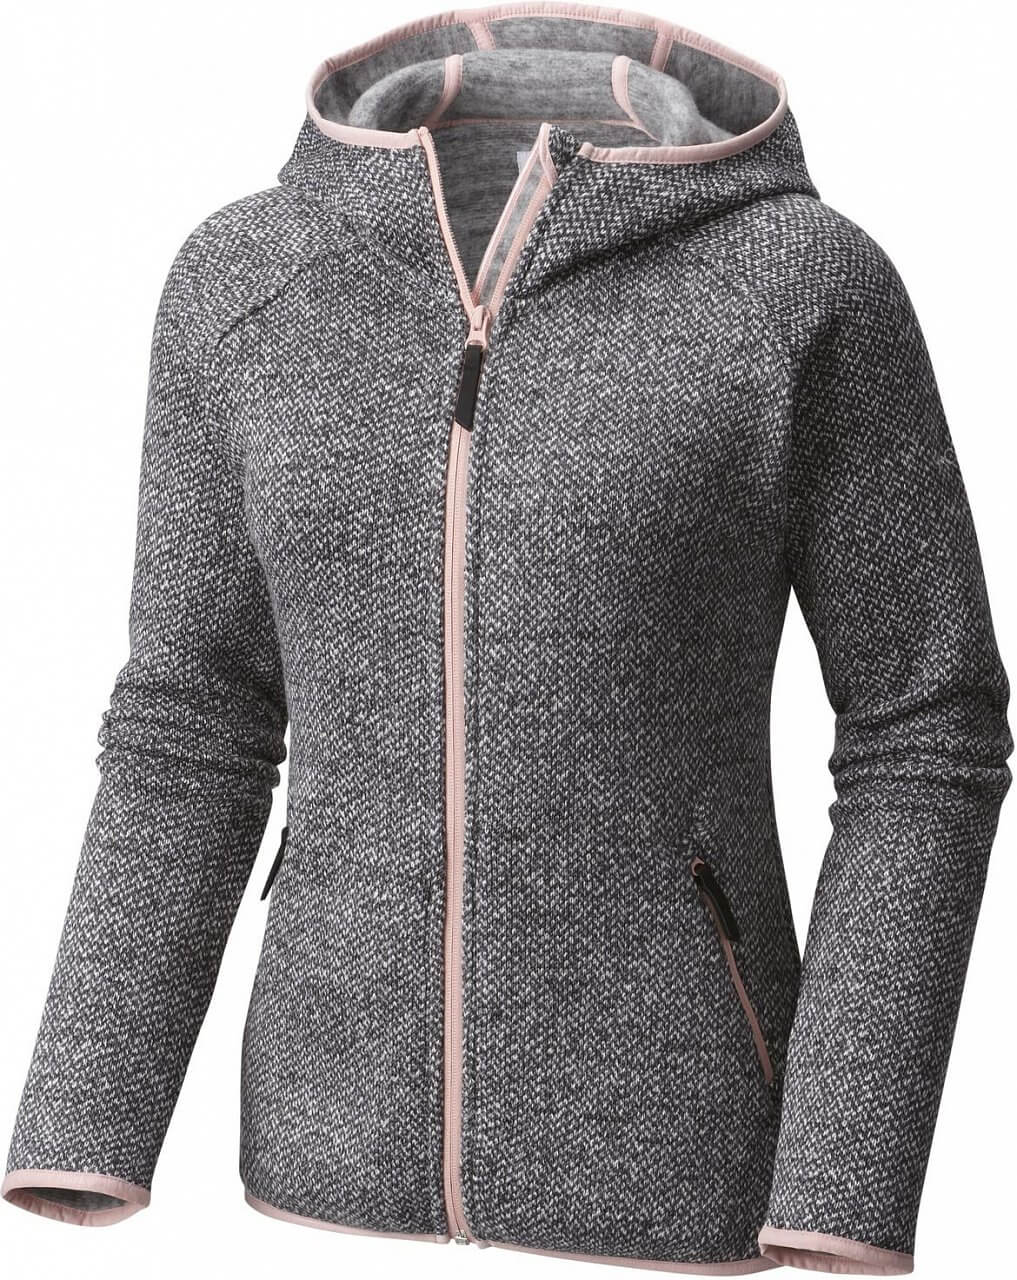 Dámská fleecová mikina Columbia Chillin Fleece